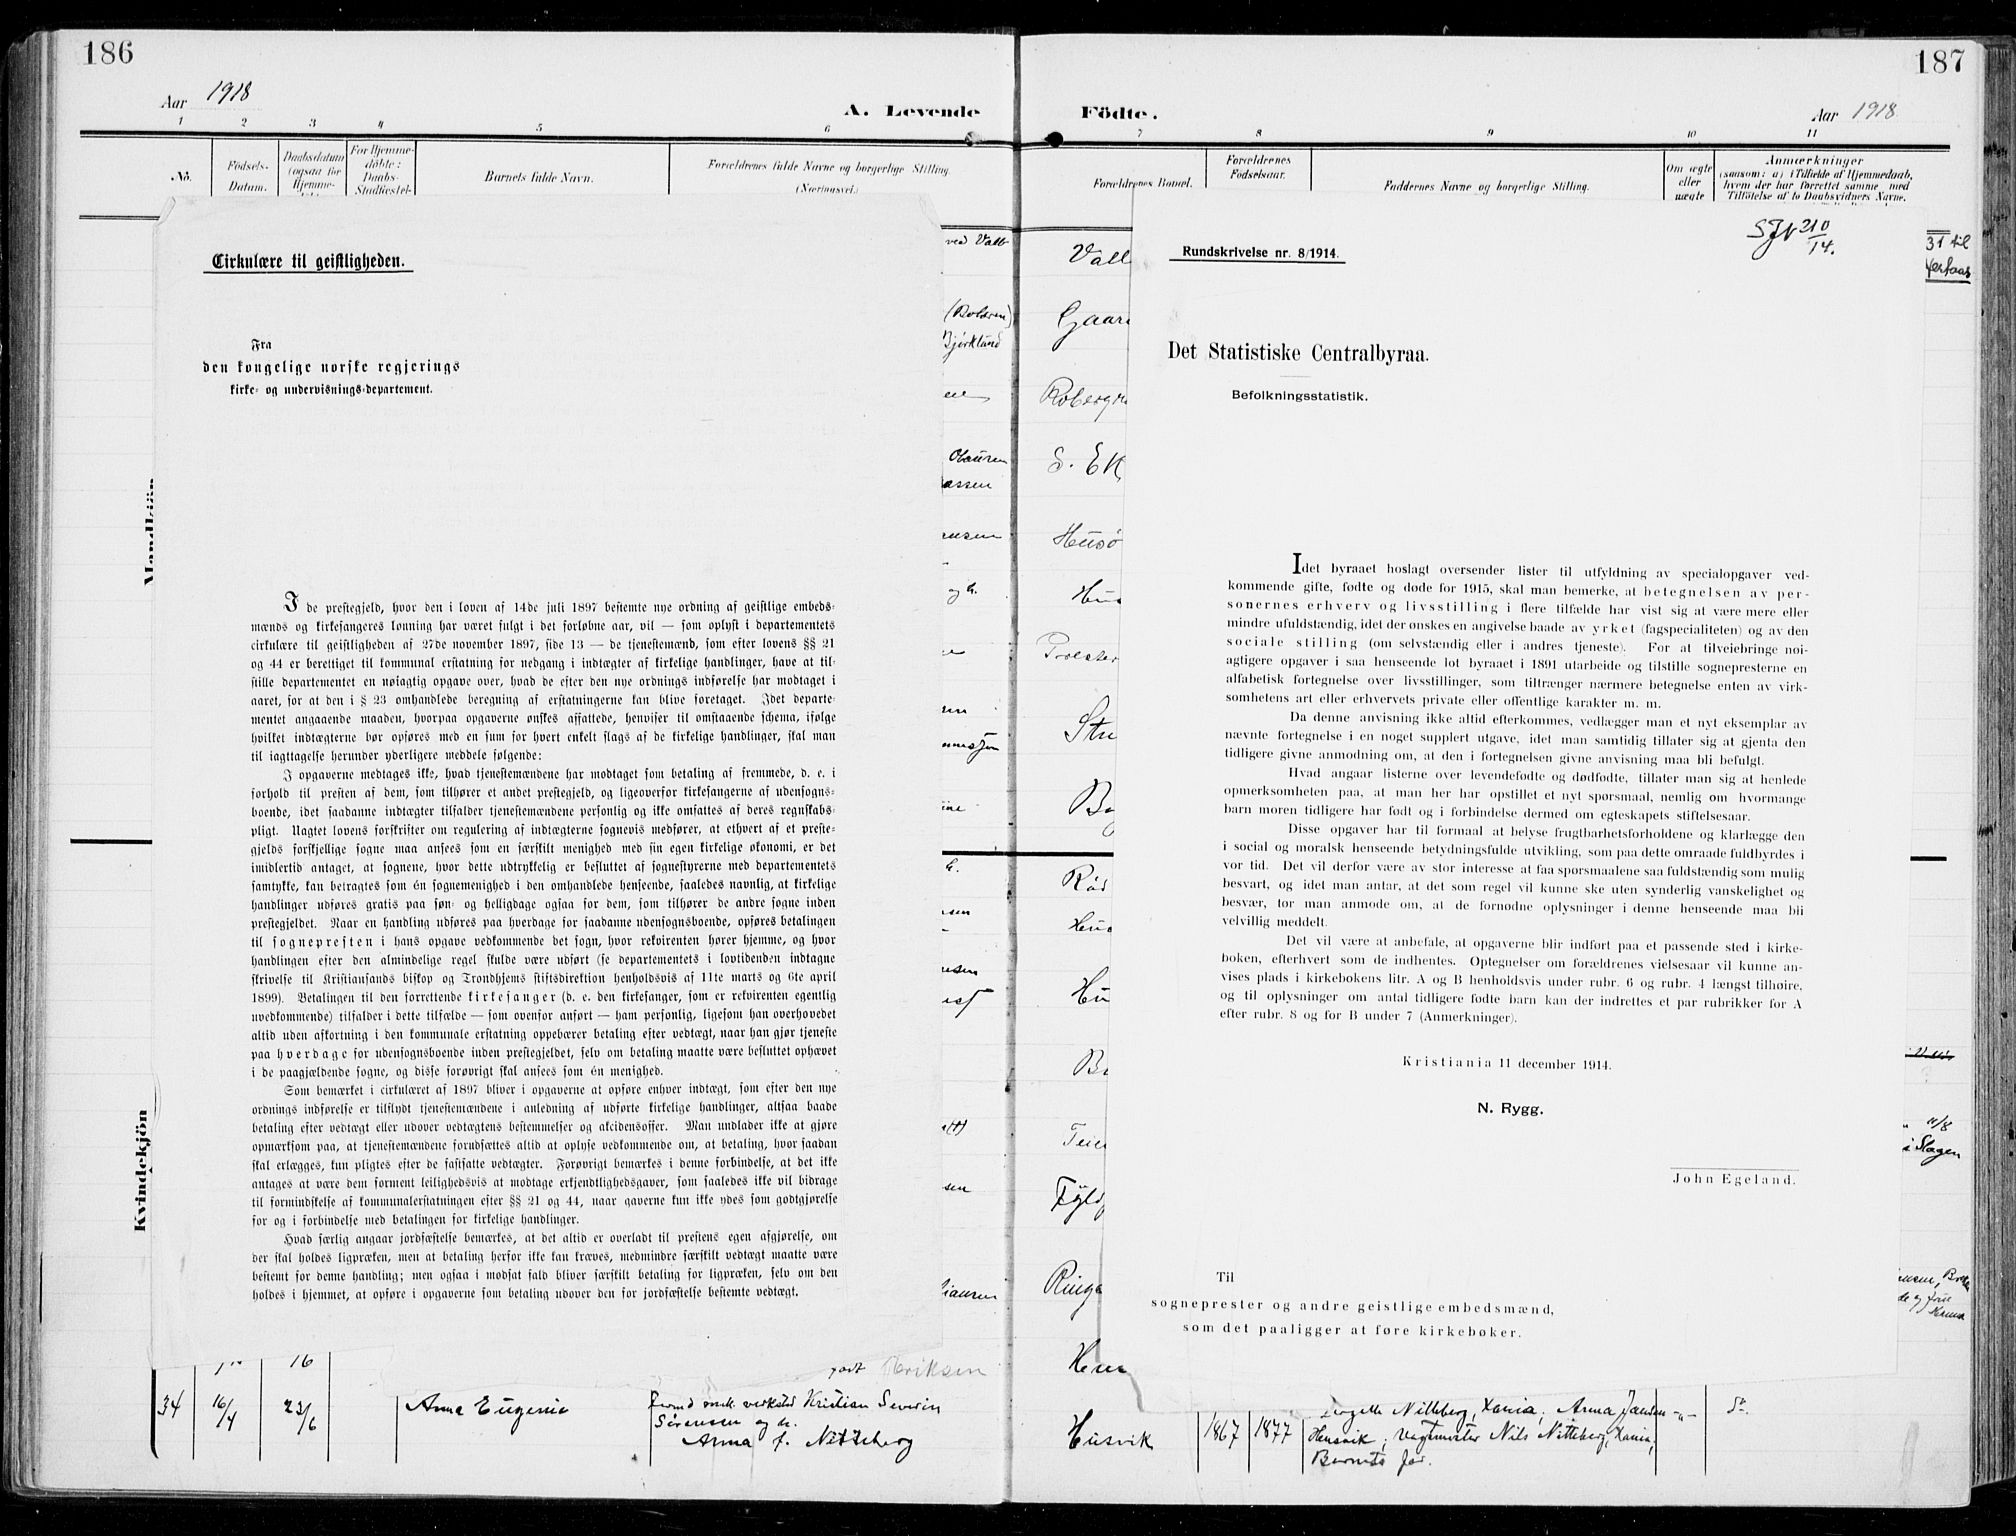 SAKO, Sem kirkebøker, F/Fb/L0006: Ministerialbok nr. II 6, 1905-1918, s. 186-187